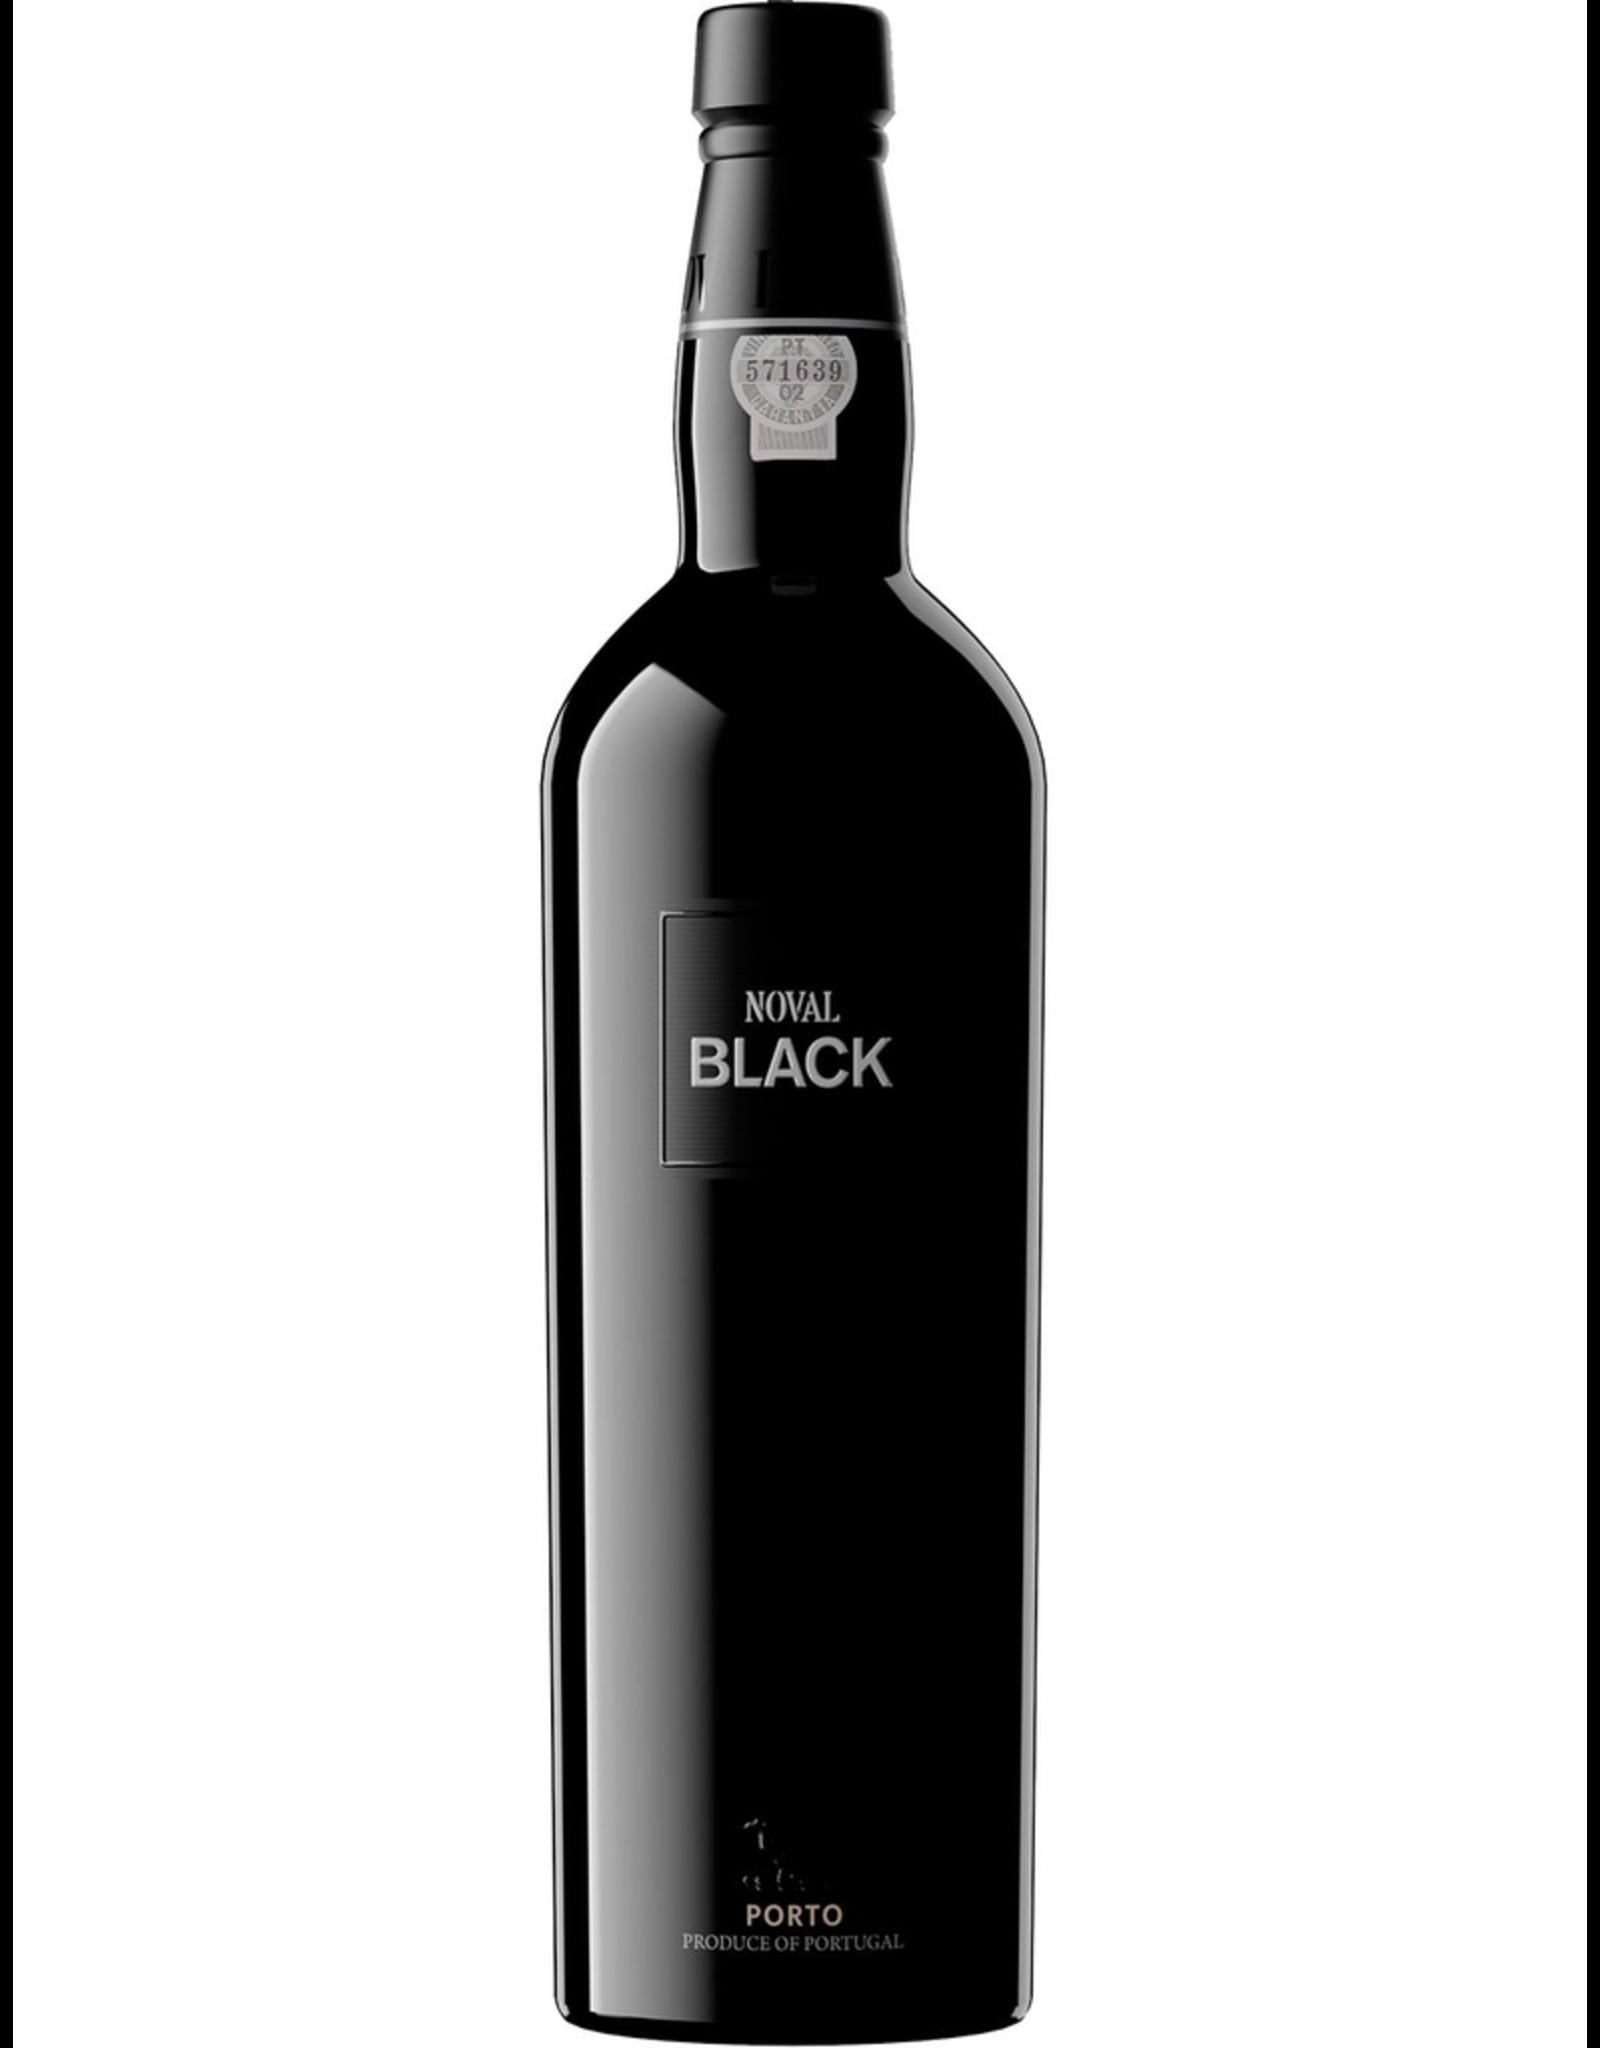 Port NV, Quinta do Noval Porto Black, Ruby Port, Douro Valley, Oporto, Portugal, 19.5% Alc, CT88